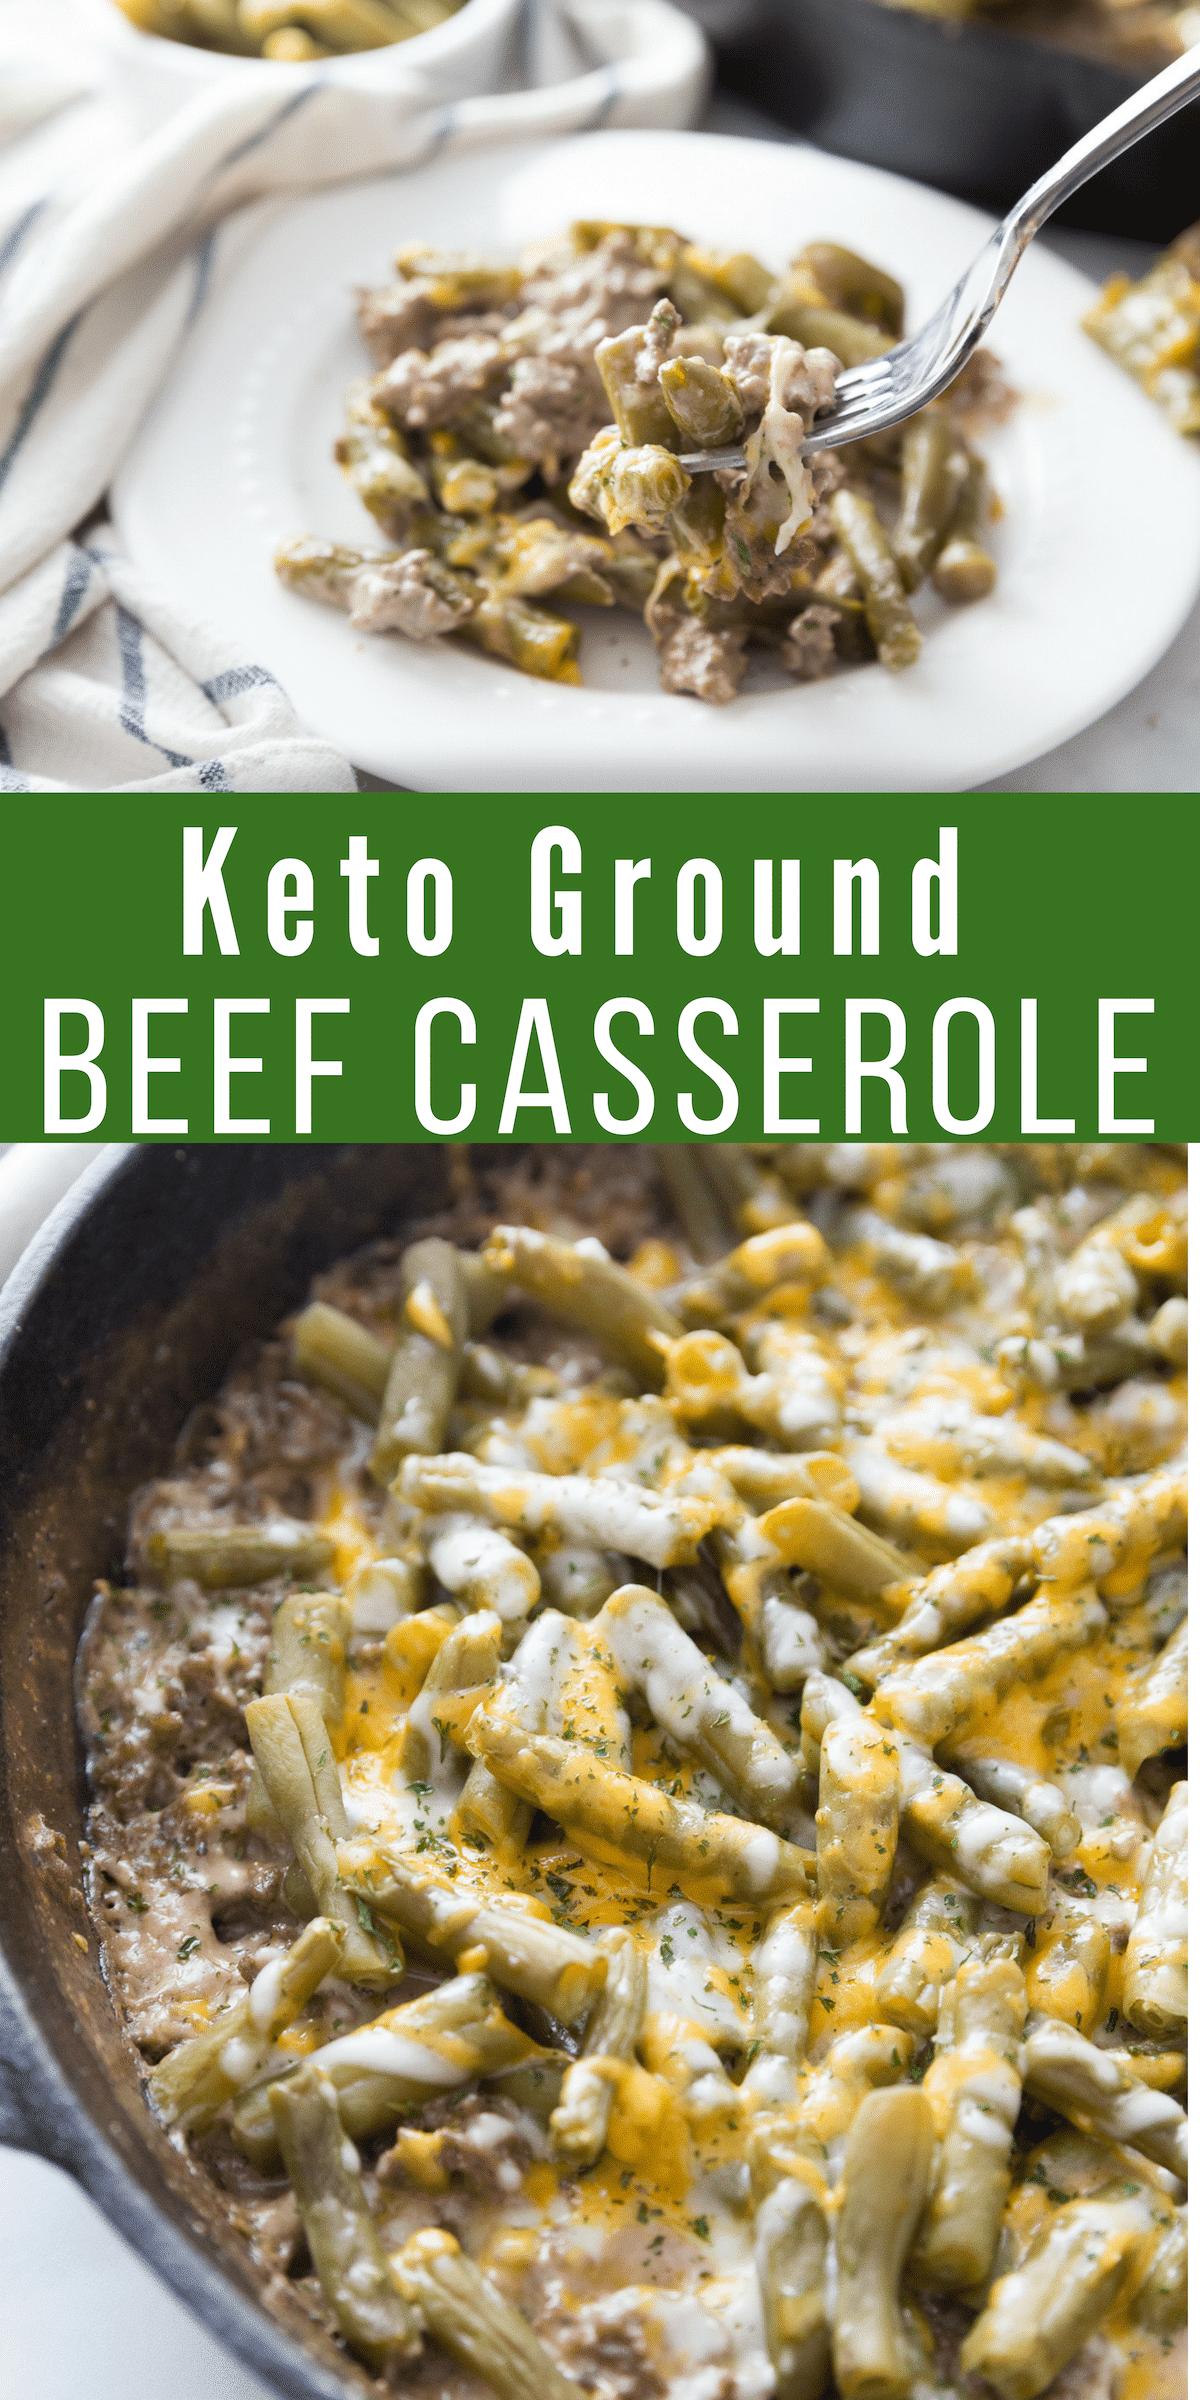 keto ground beef recipe collage